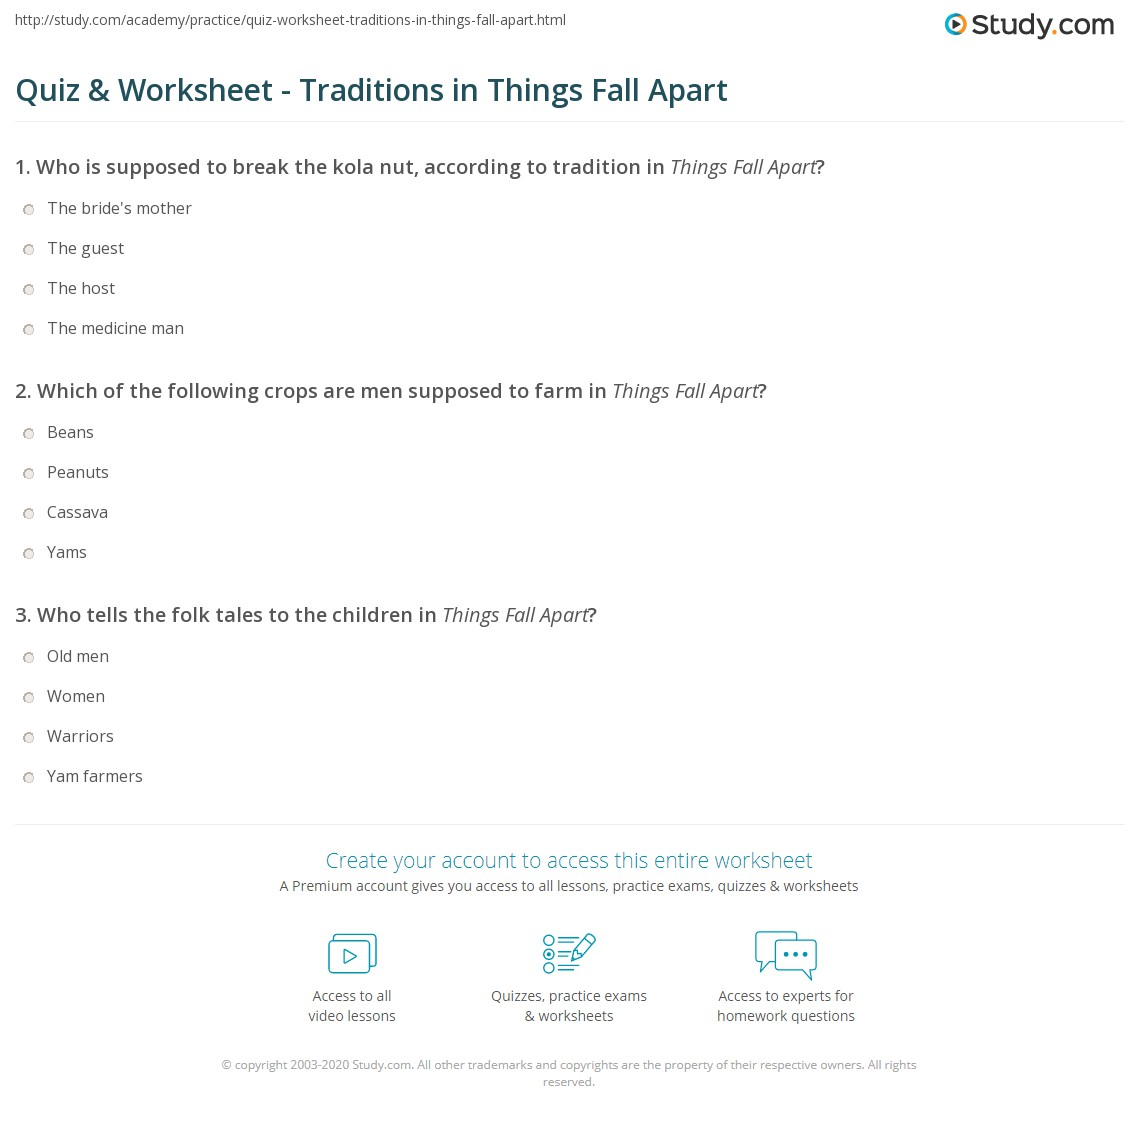 All Things Fall Apart Plot: Quiz & Worksheet - Traditions In Things Fall Apart